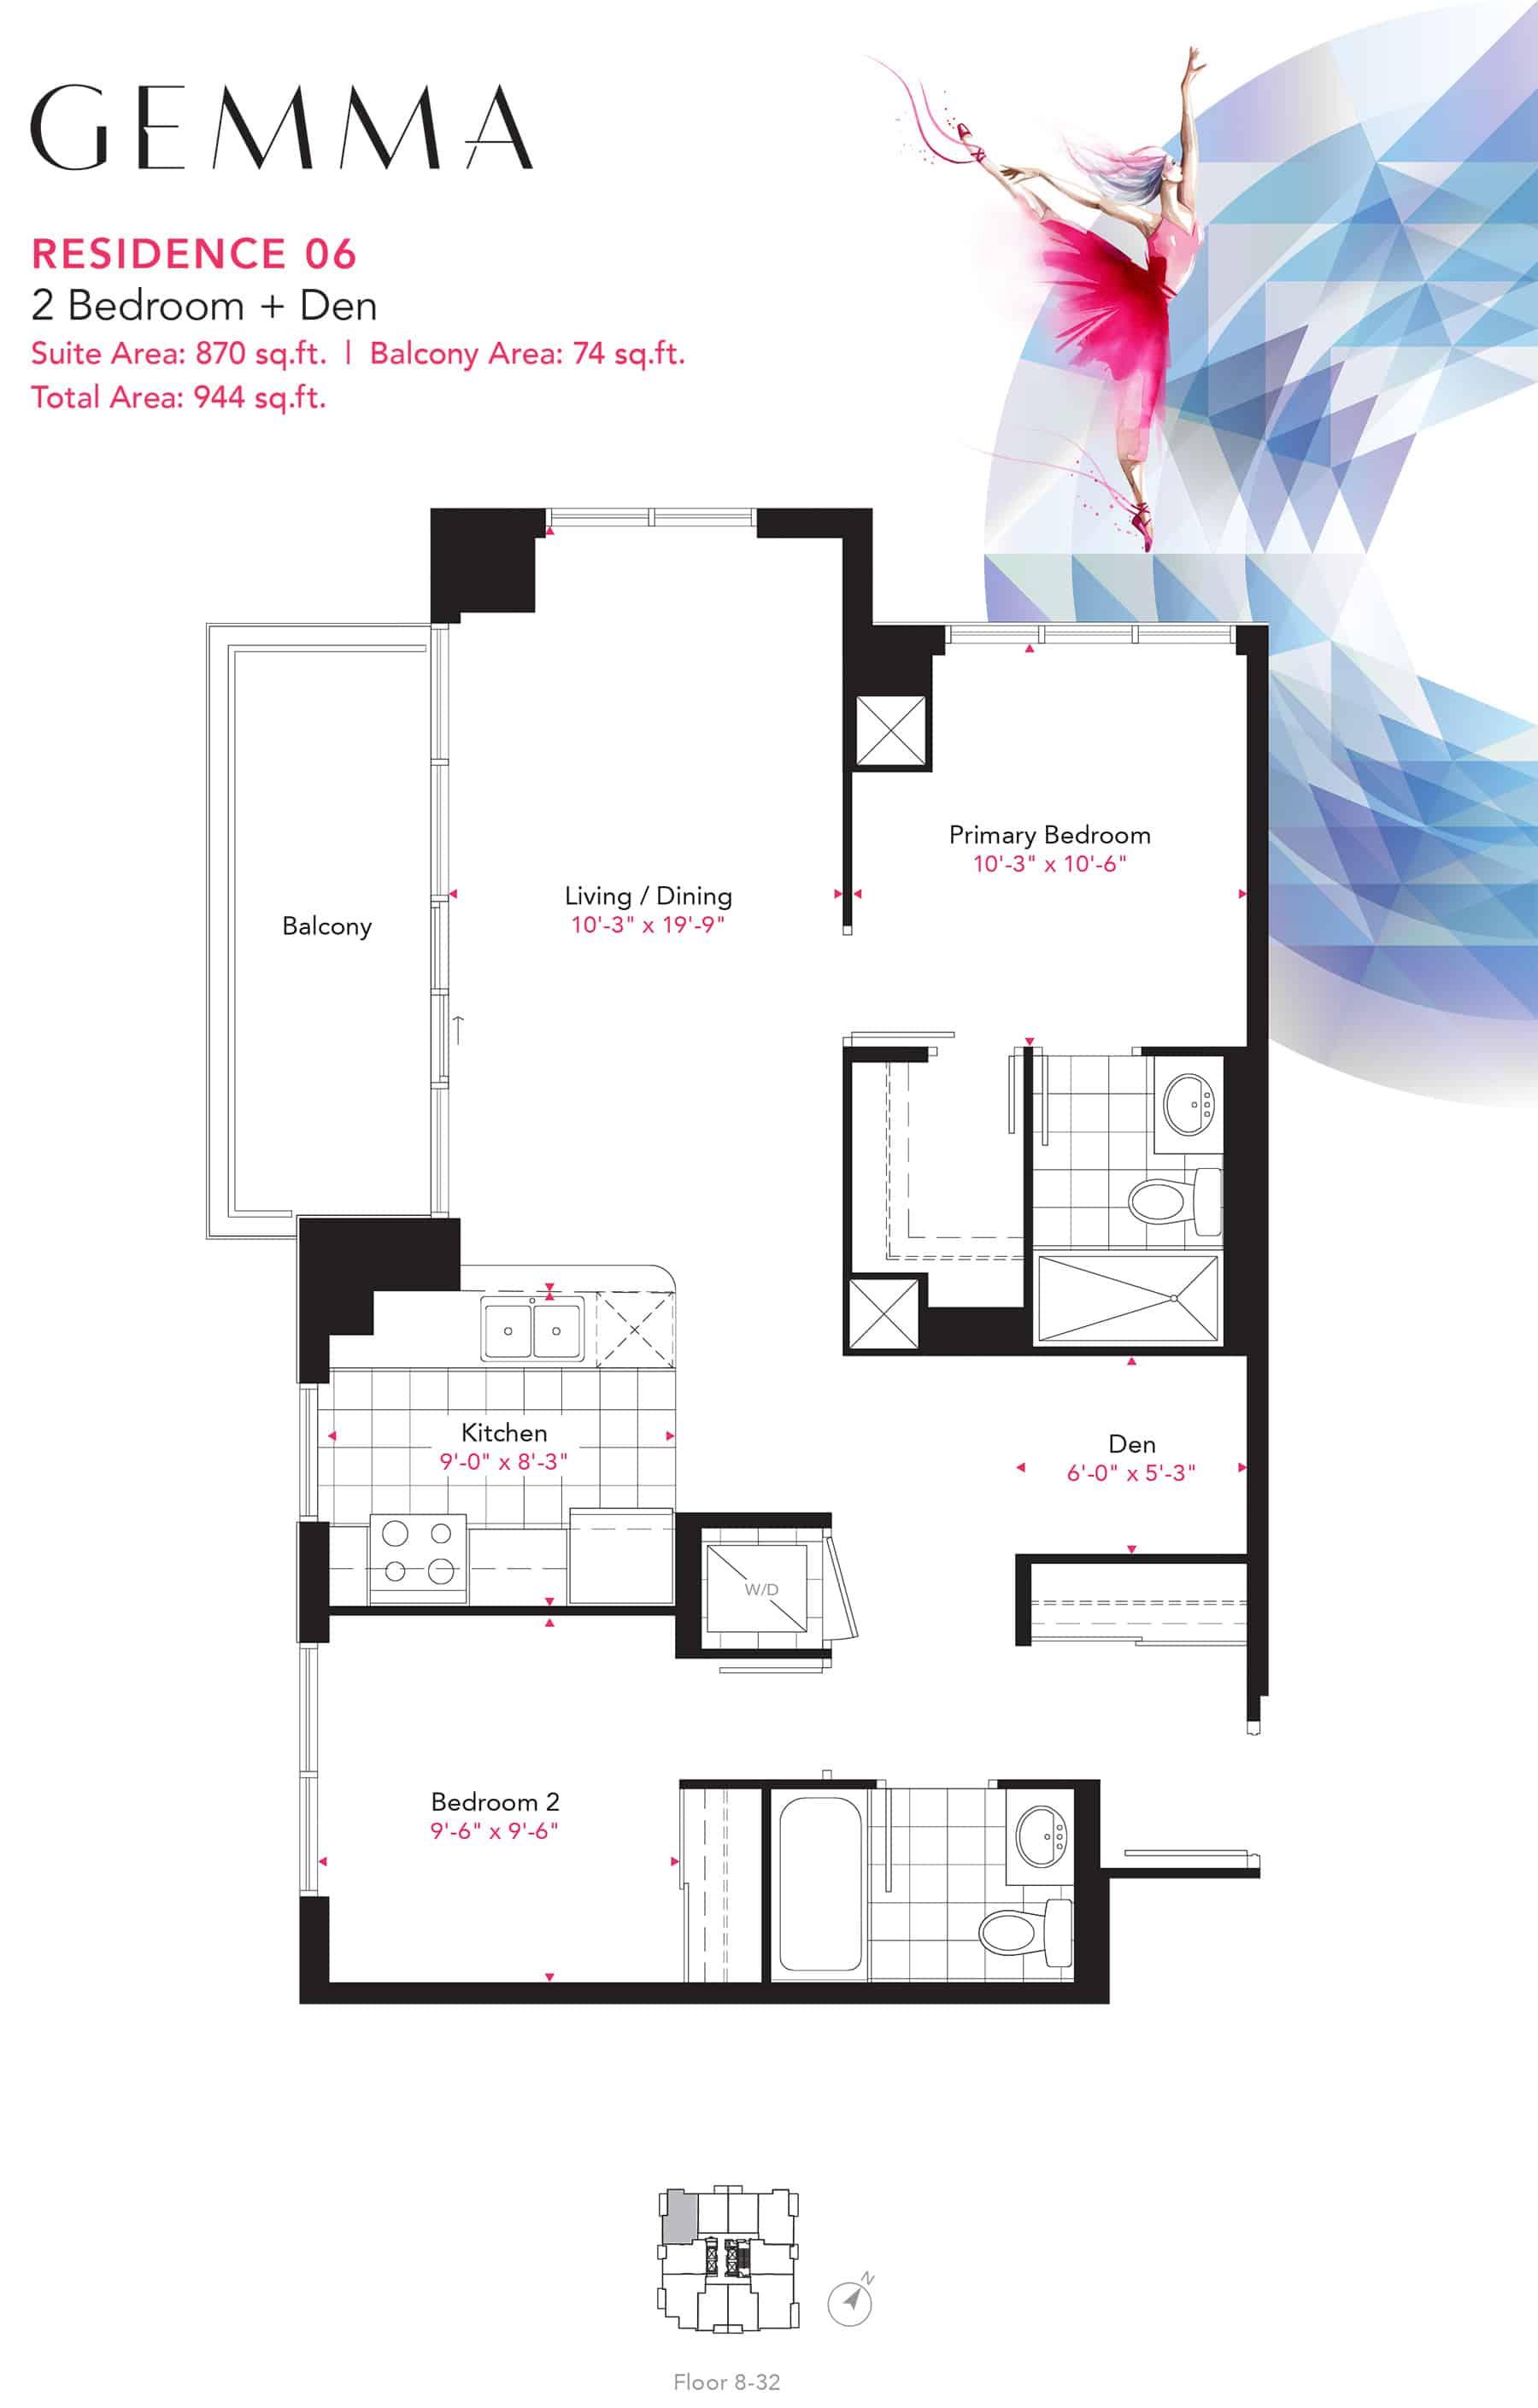 Residence-06-2B+D-870-Sqft-Gemma  Gemma Condos Residence 06 2BD 870 Sqft Gemma